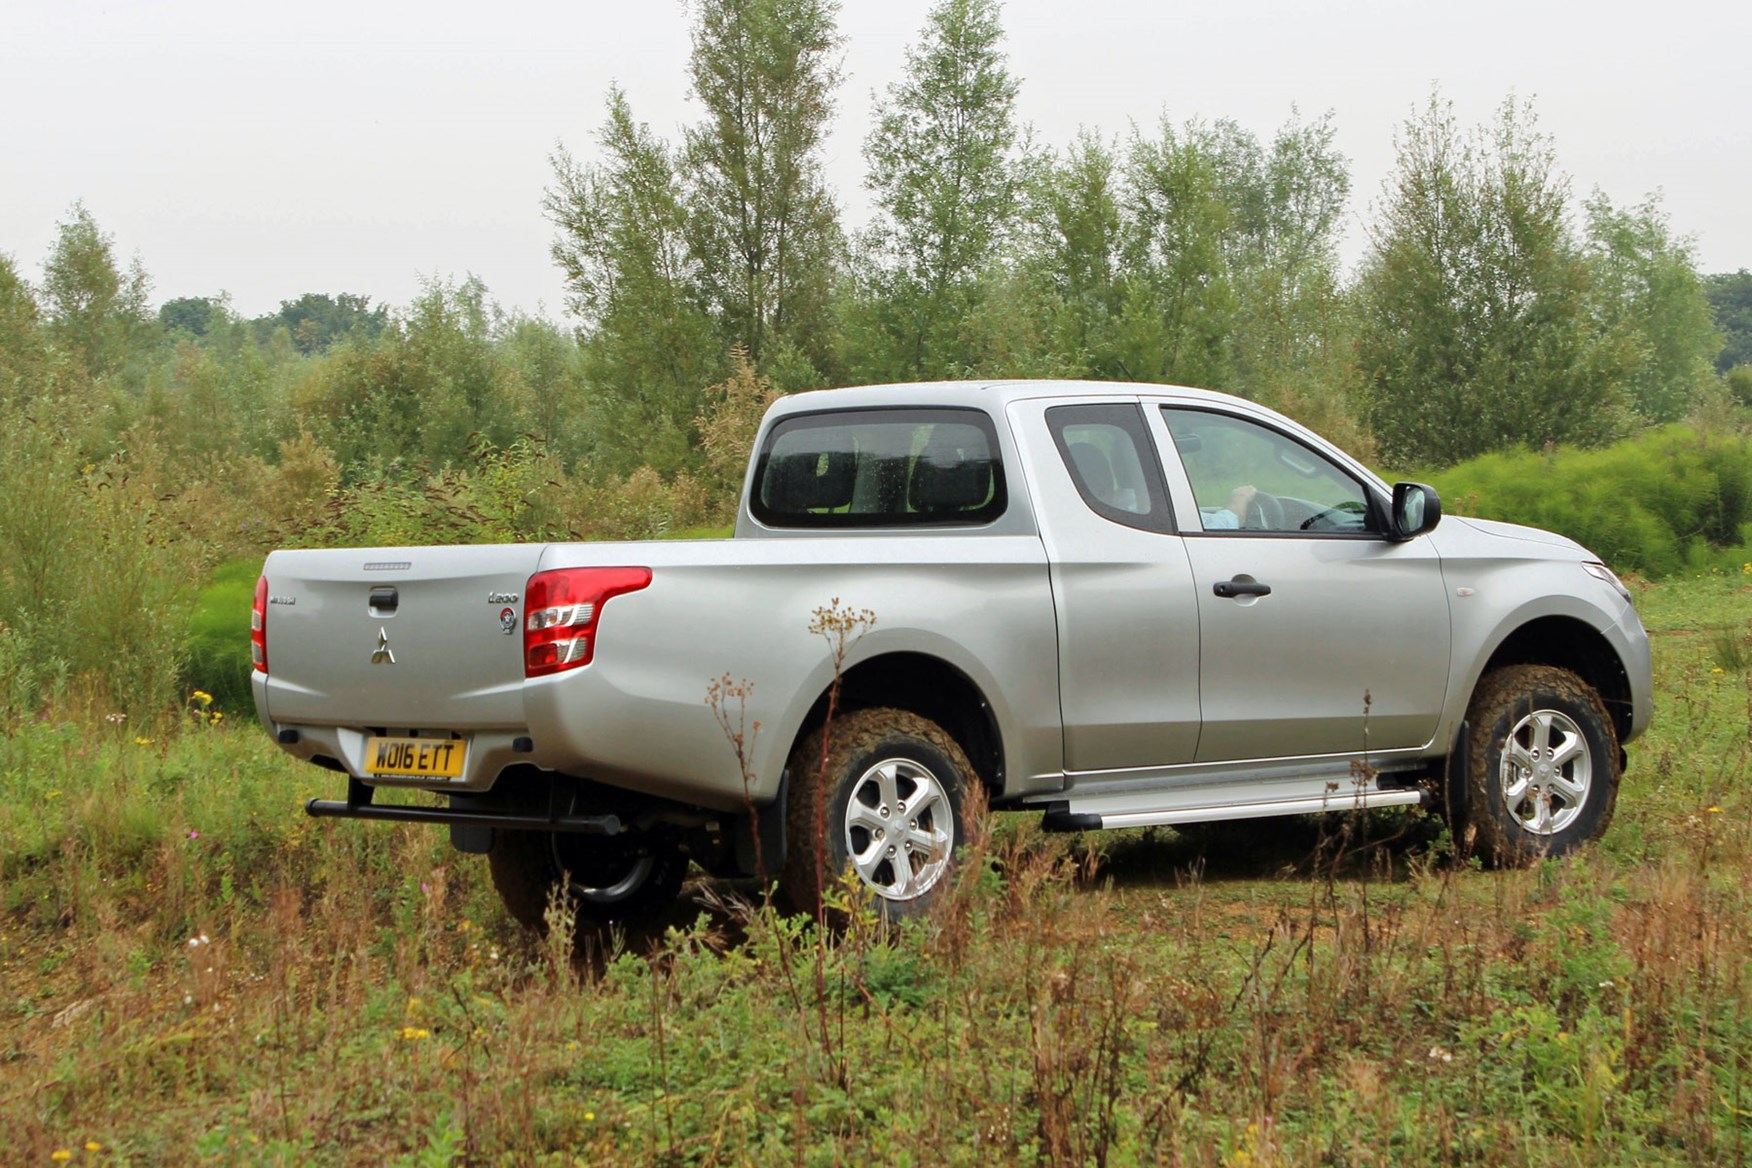 Mitsubishi L200 4Life Club Cab review - rear view, silver